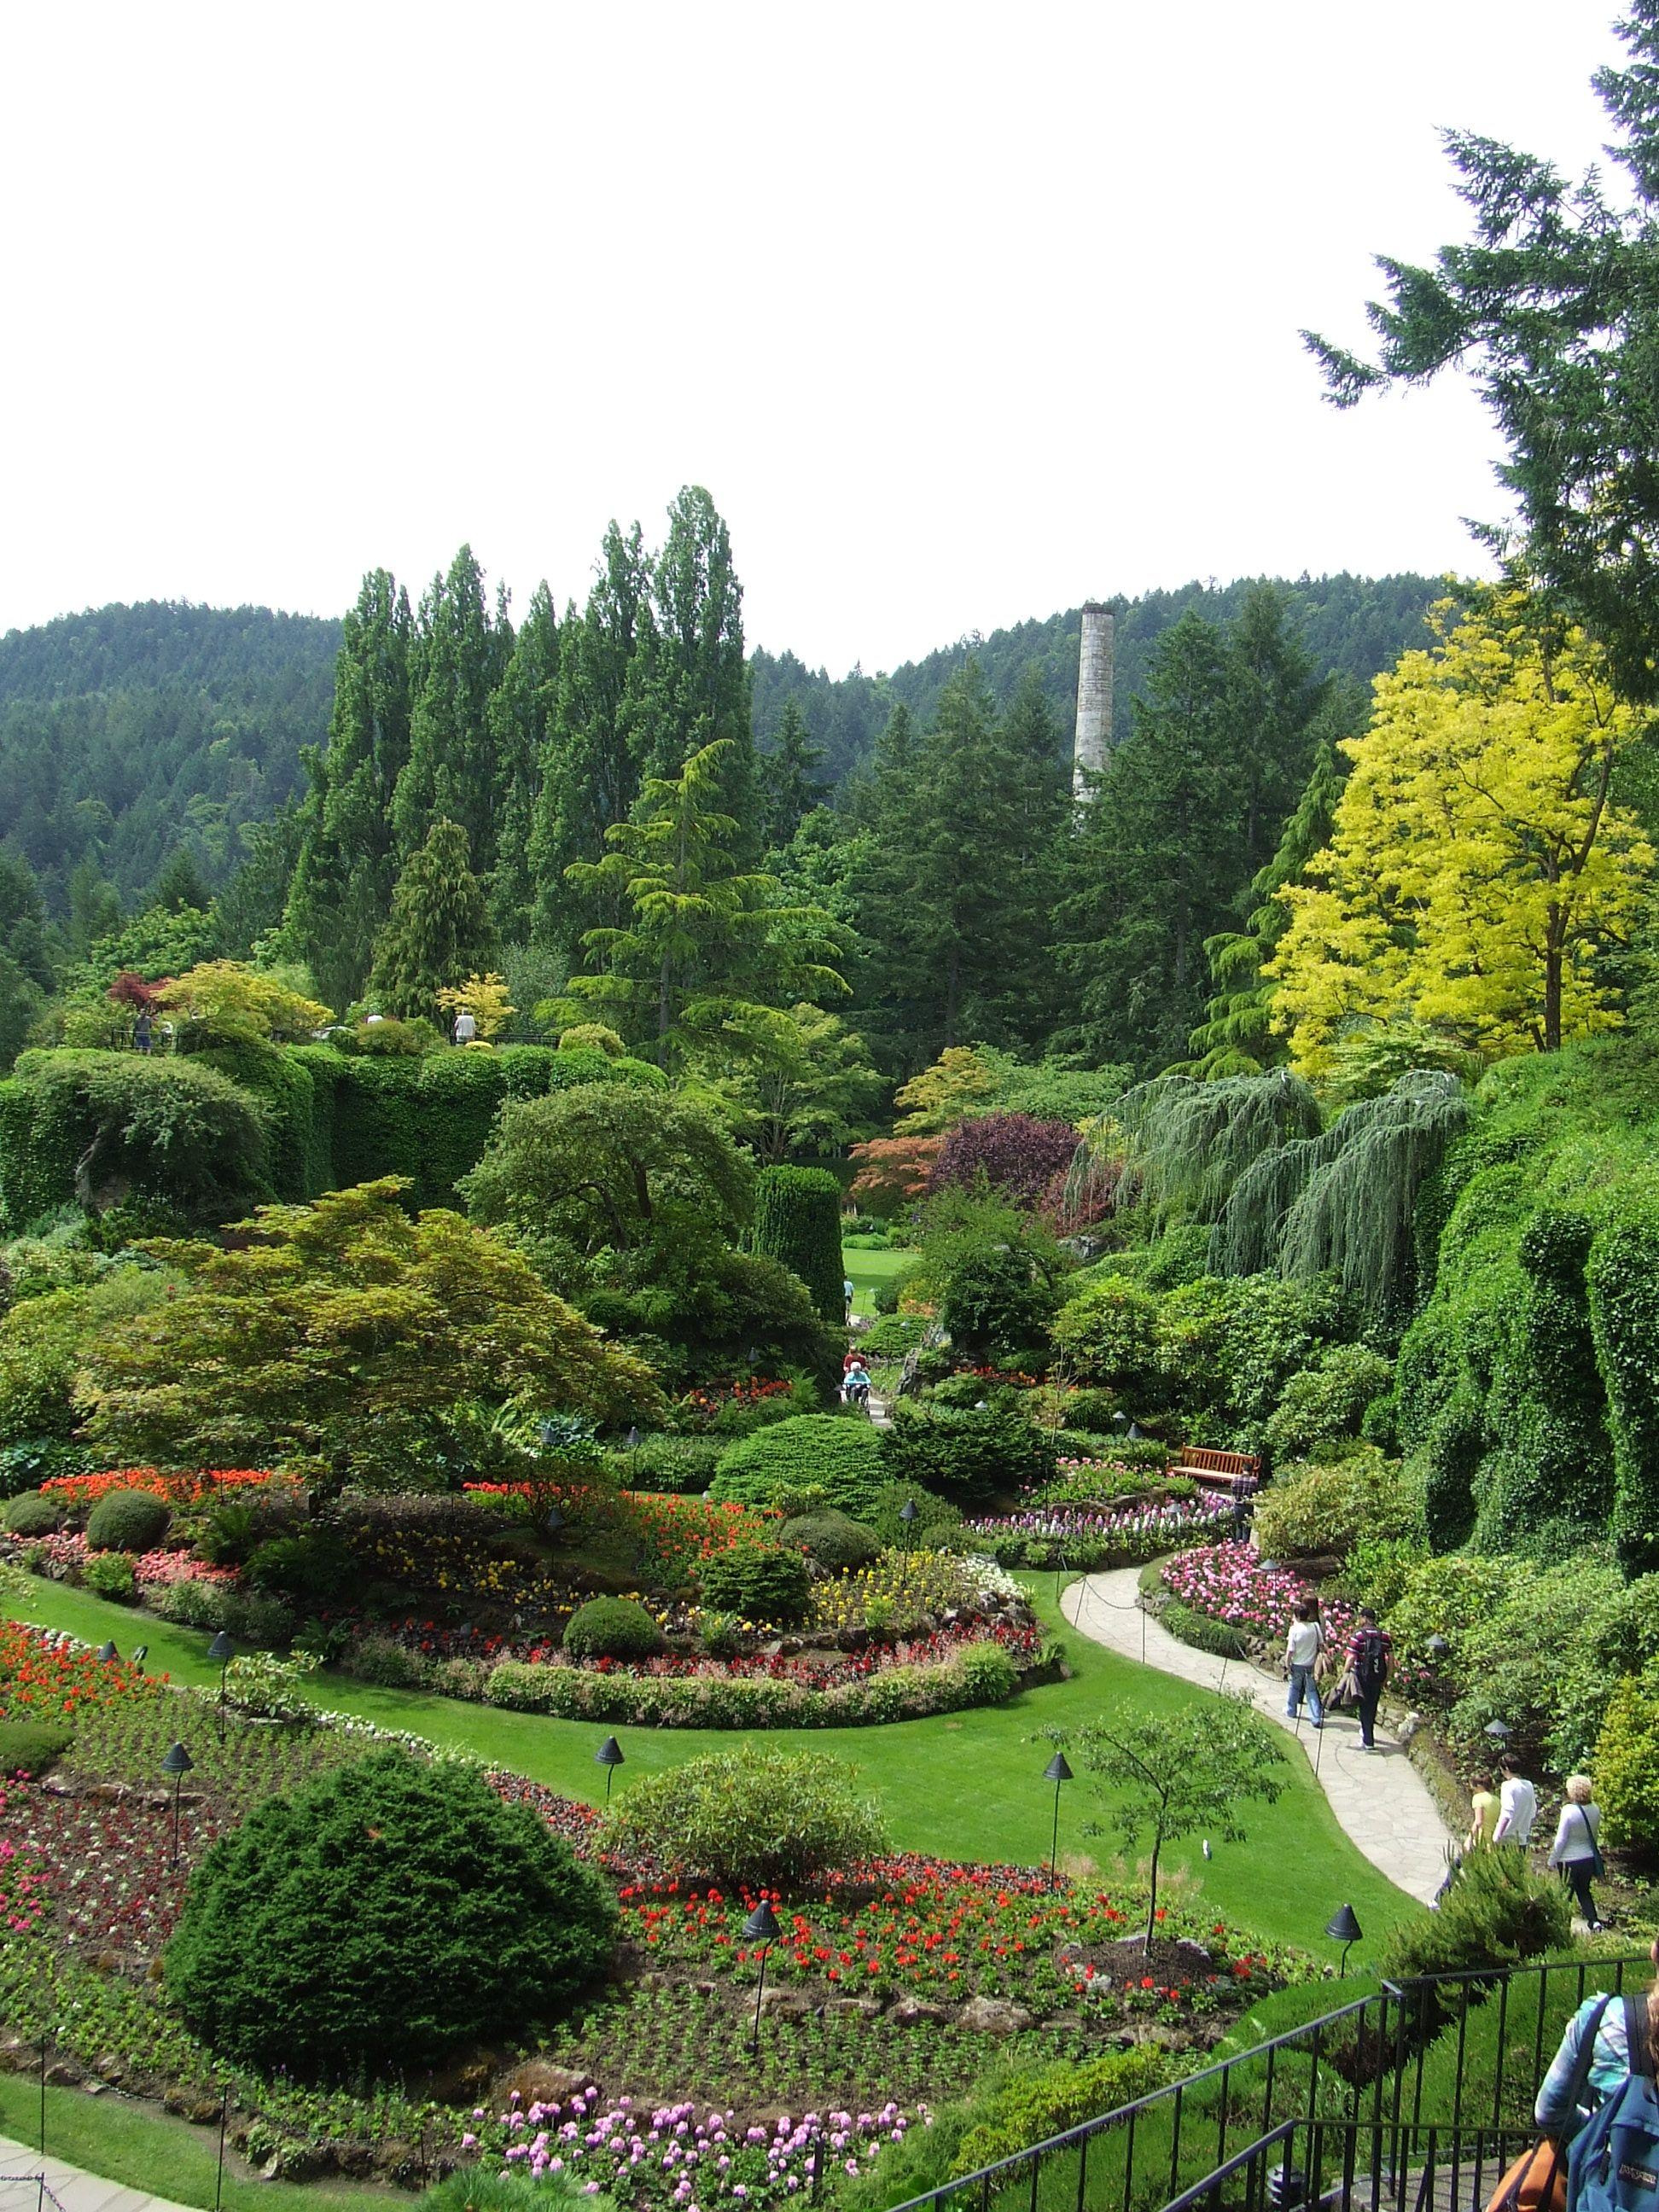 Victoria, B.C. Buchart gardens, Botanical gardens near